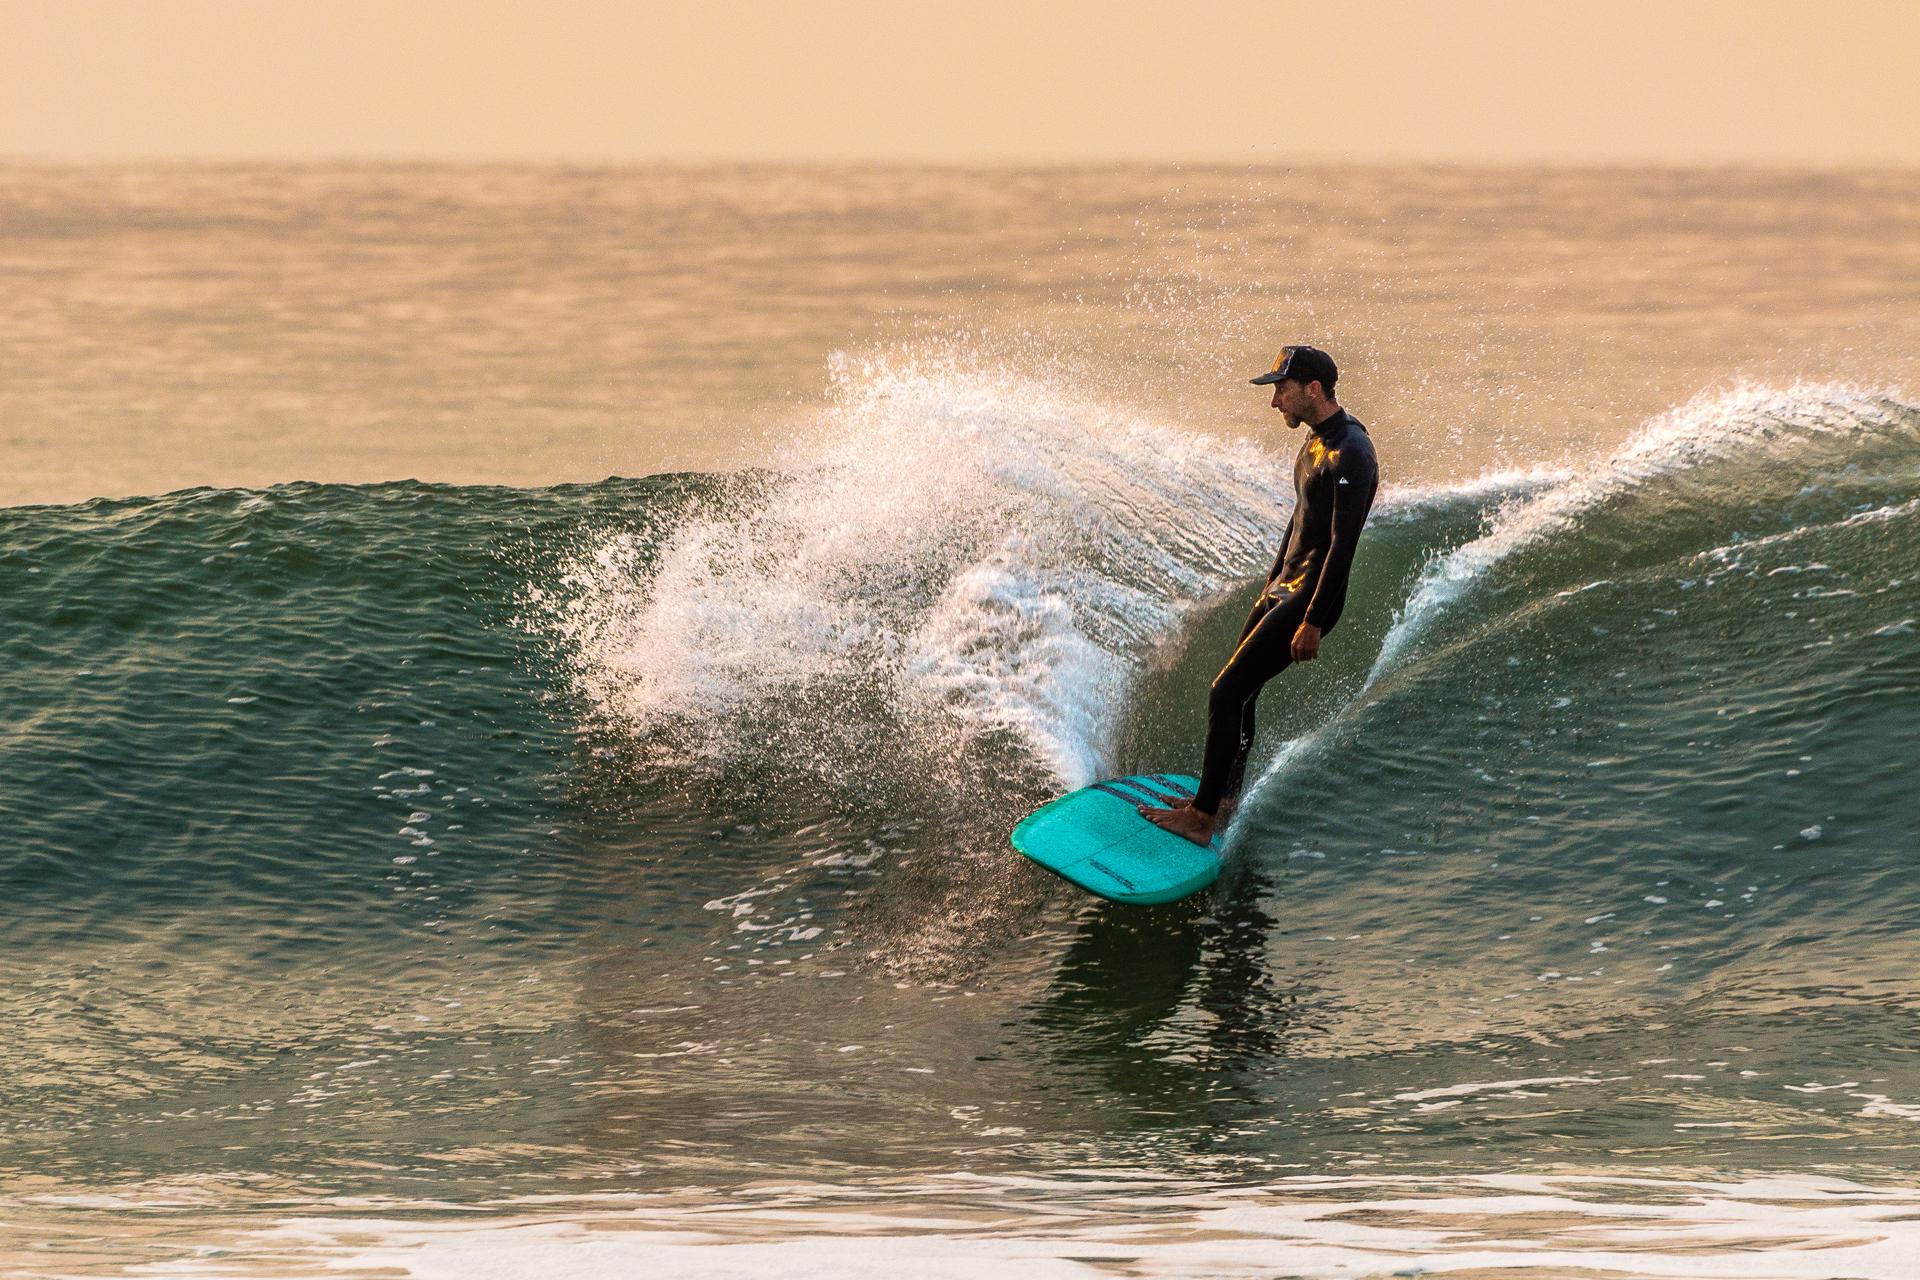 swb_surfing_004